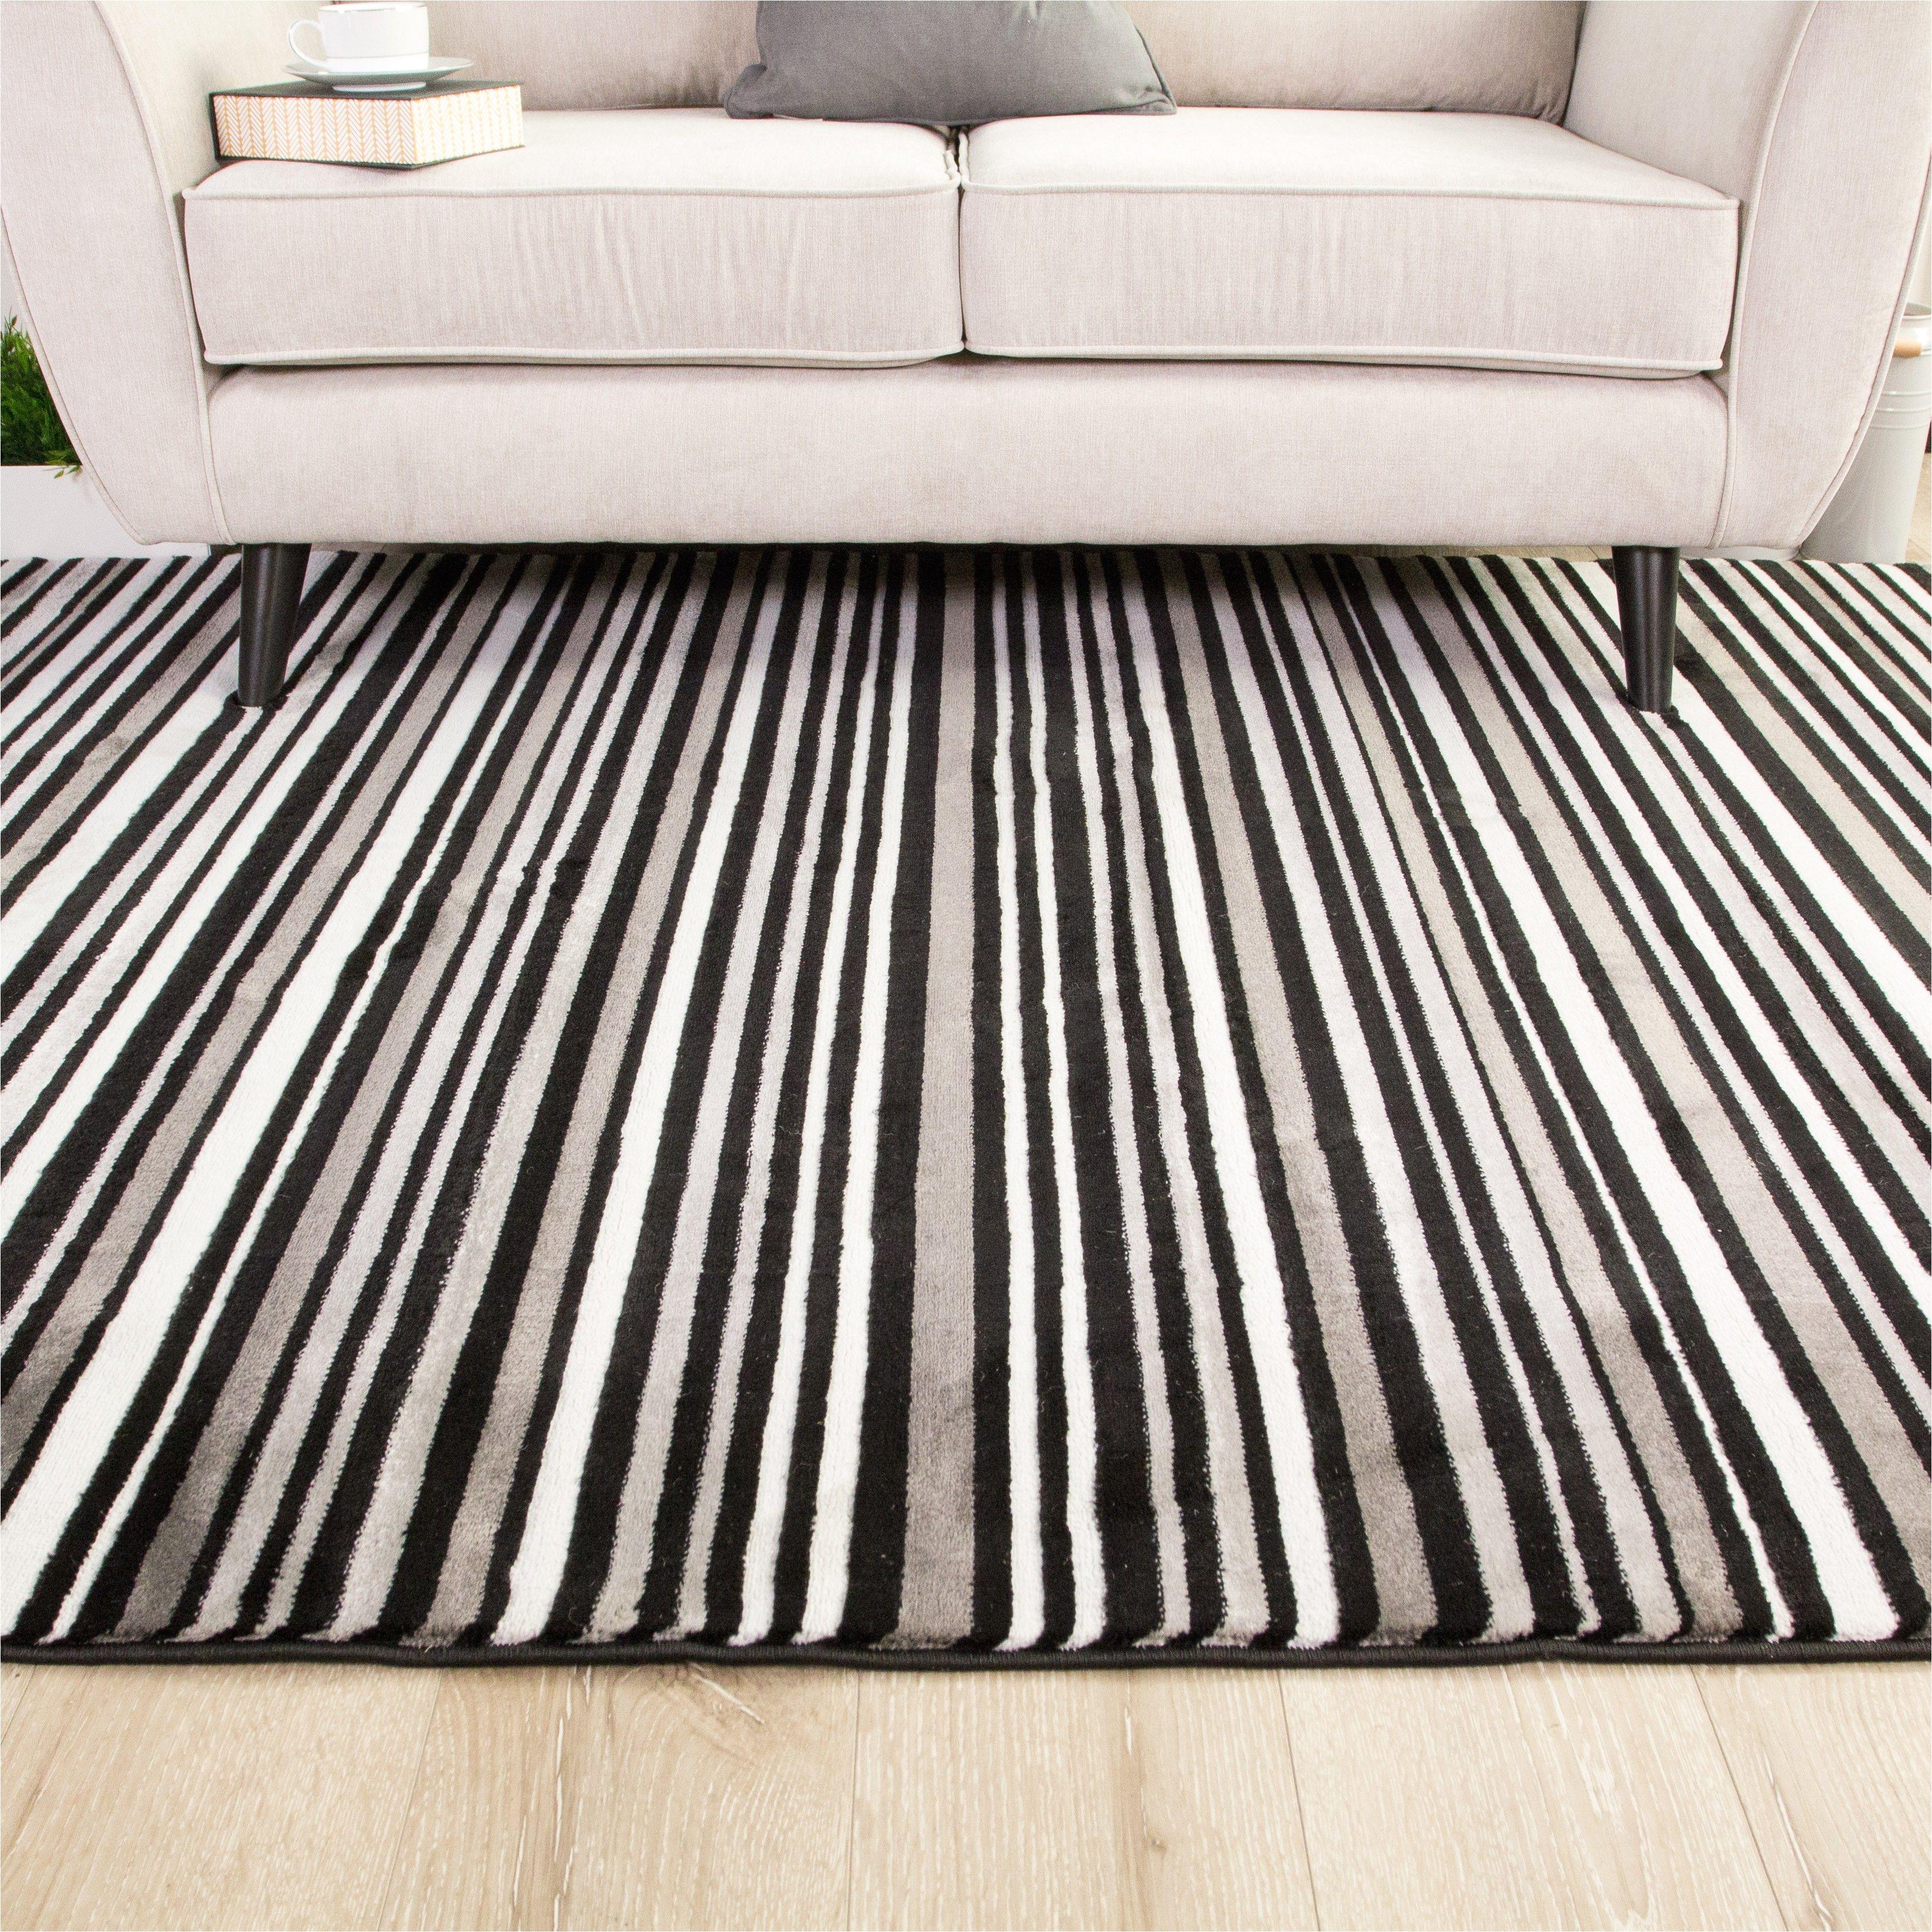 Black And White Striped Runner Rug Hallway Sardinia